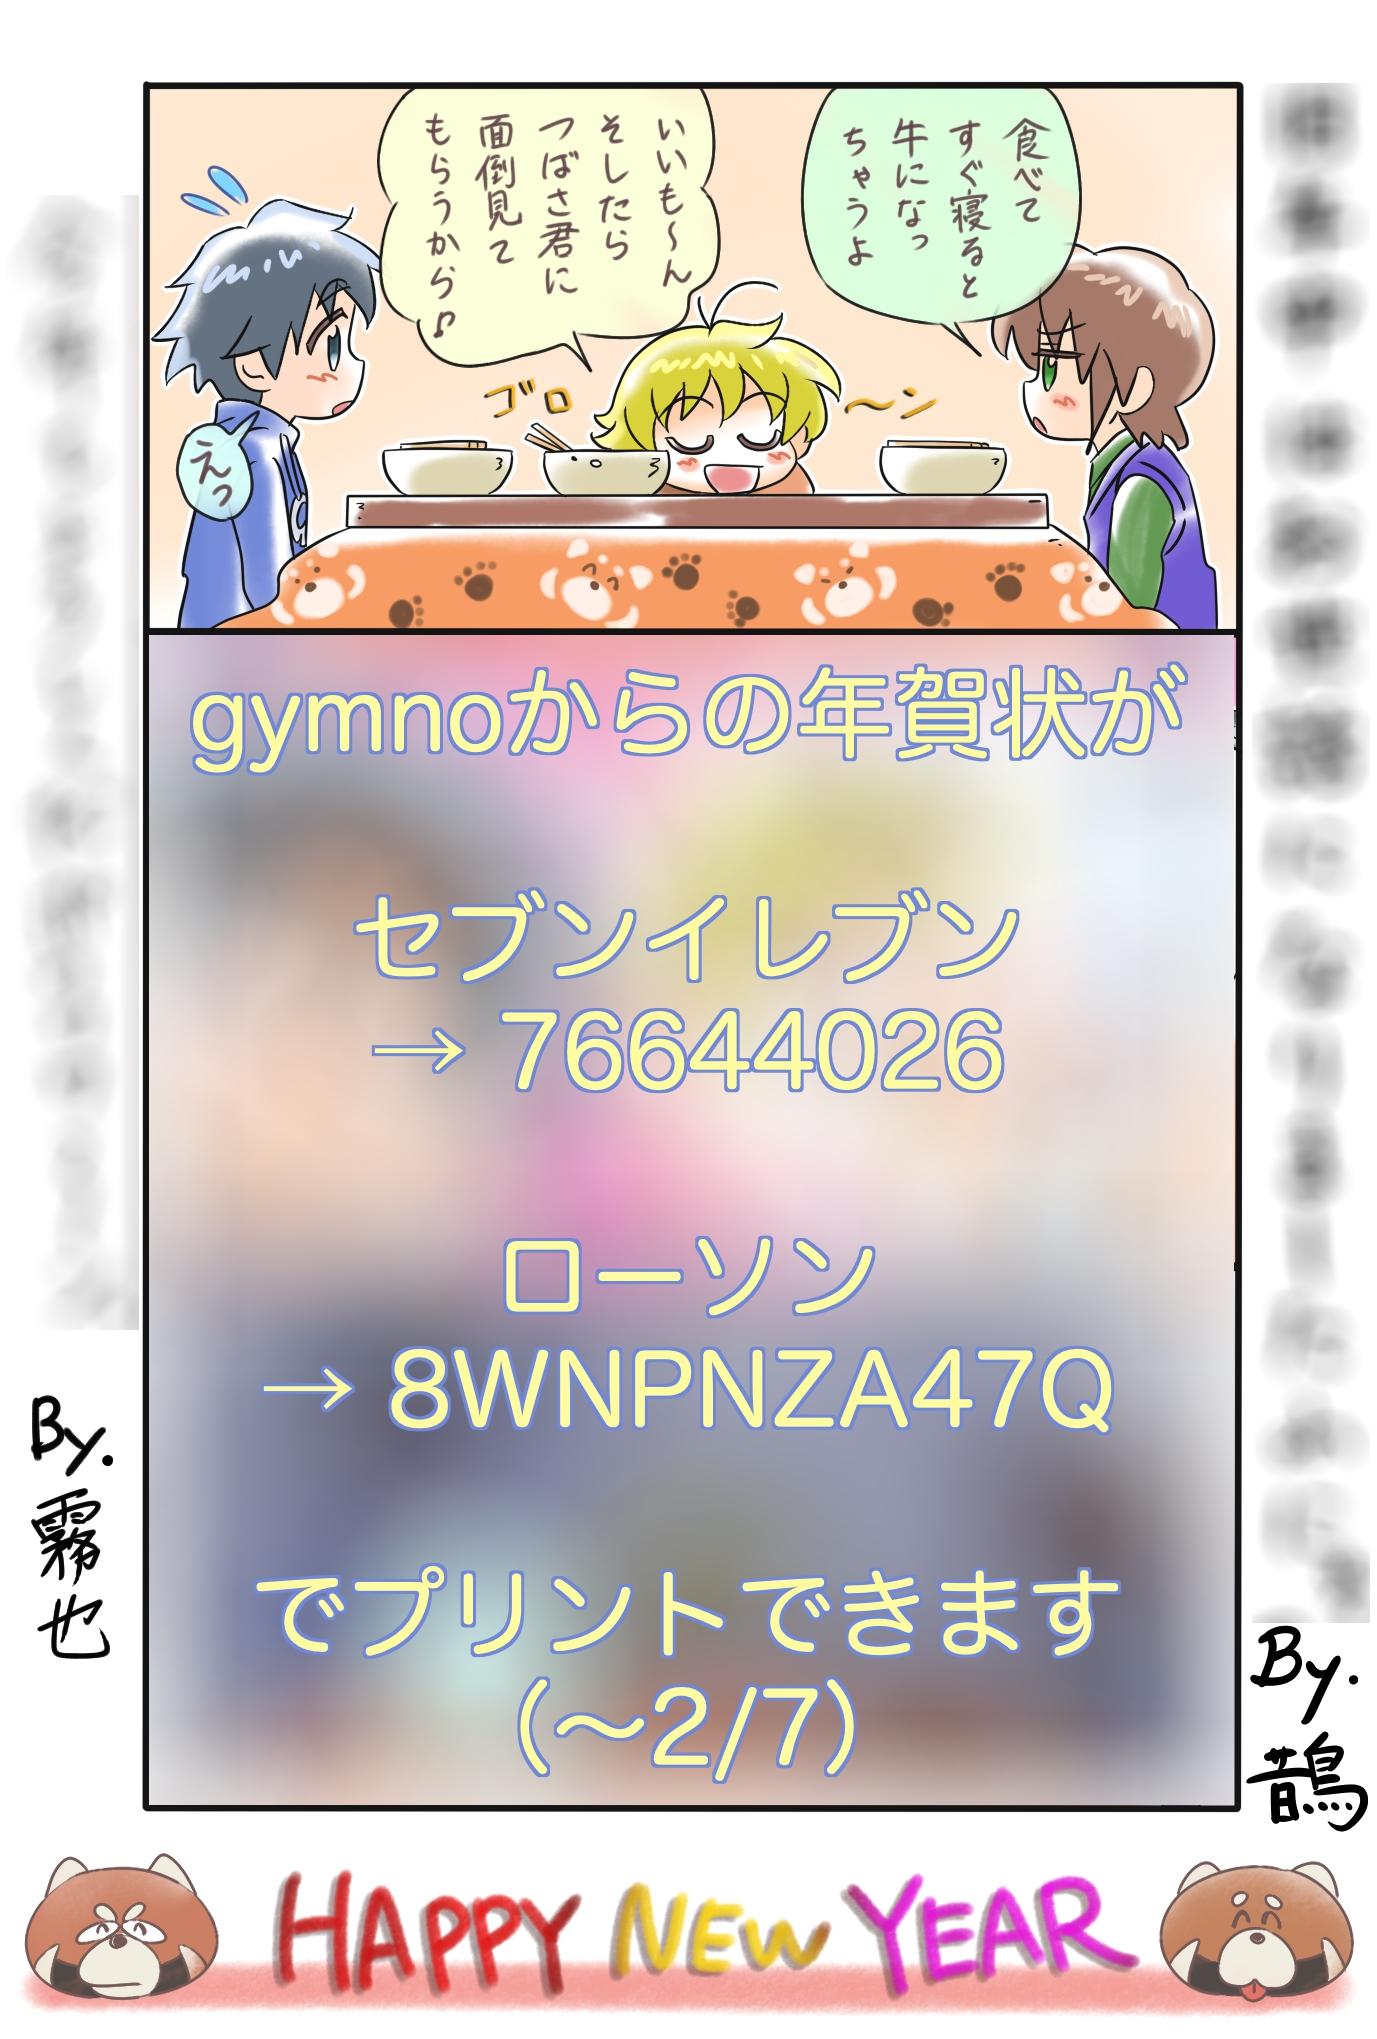 gymno2021nenga_s.jpg